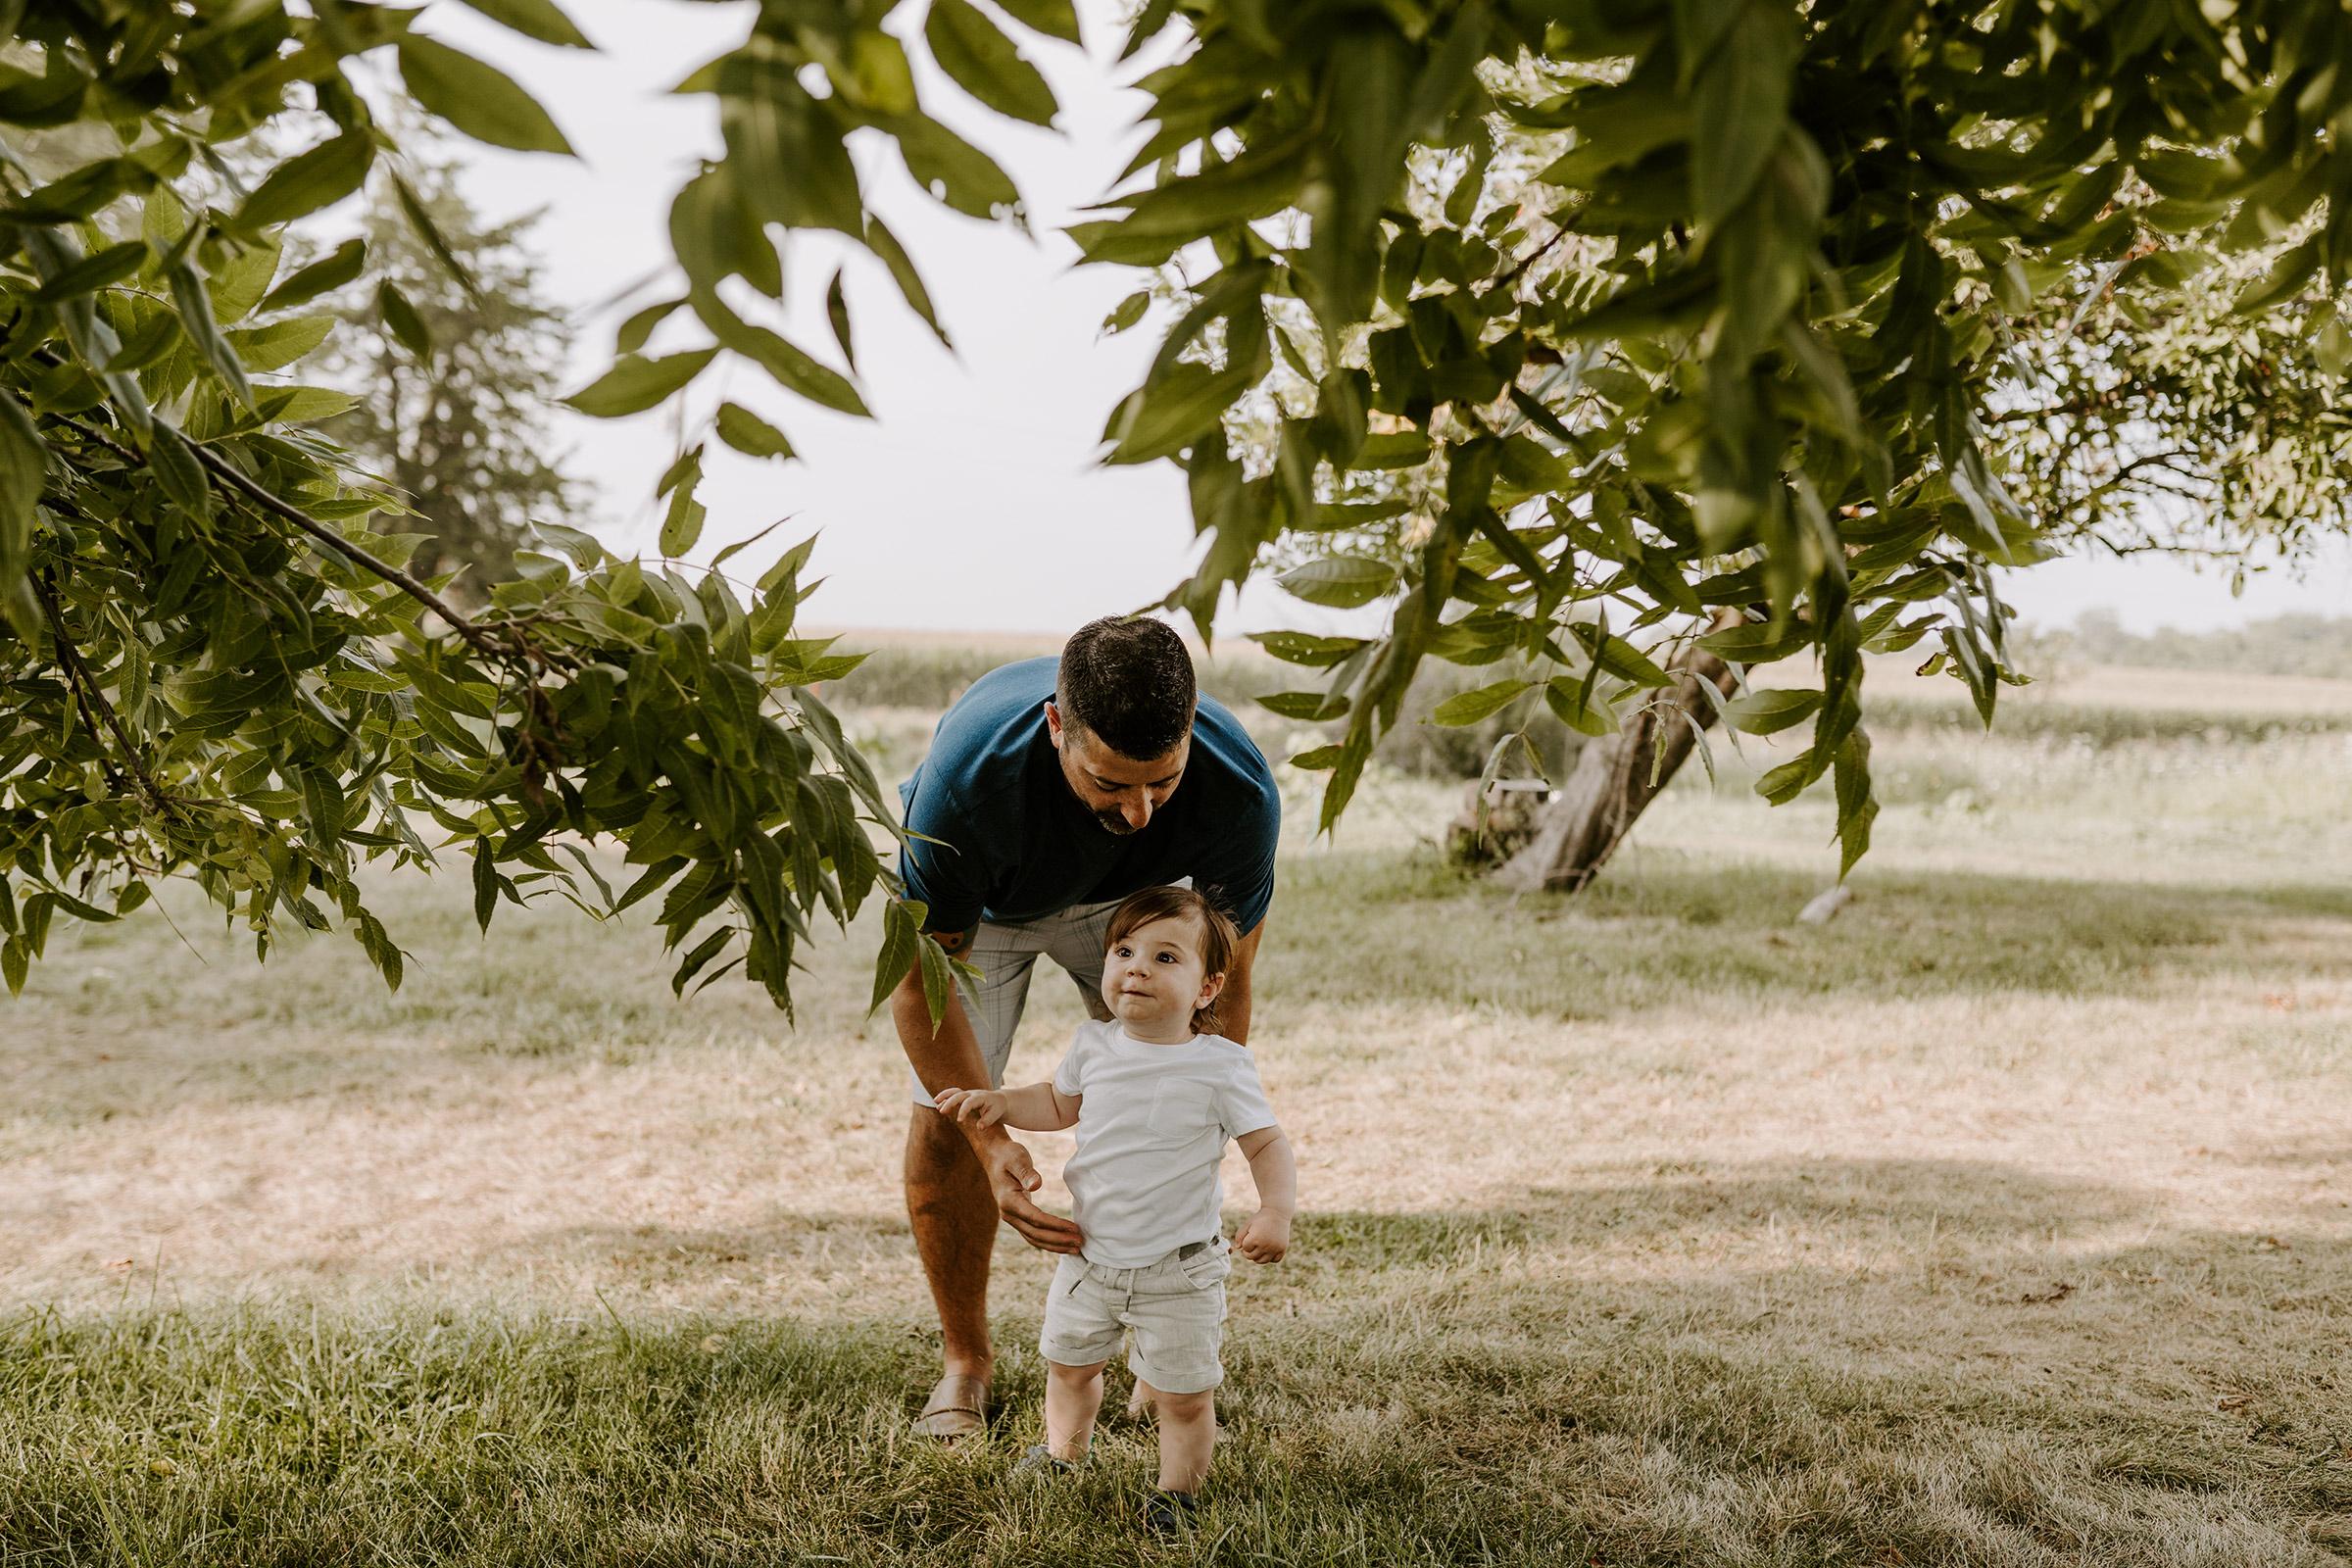 natale-family-son-walking-with-dad-by-walnut-tree-iris-aisle--winterset-iowa-raelyn-ramey-photography-9.jpg